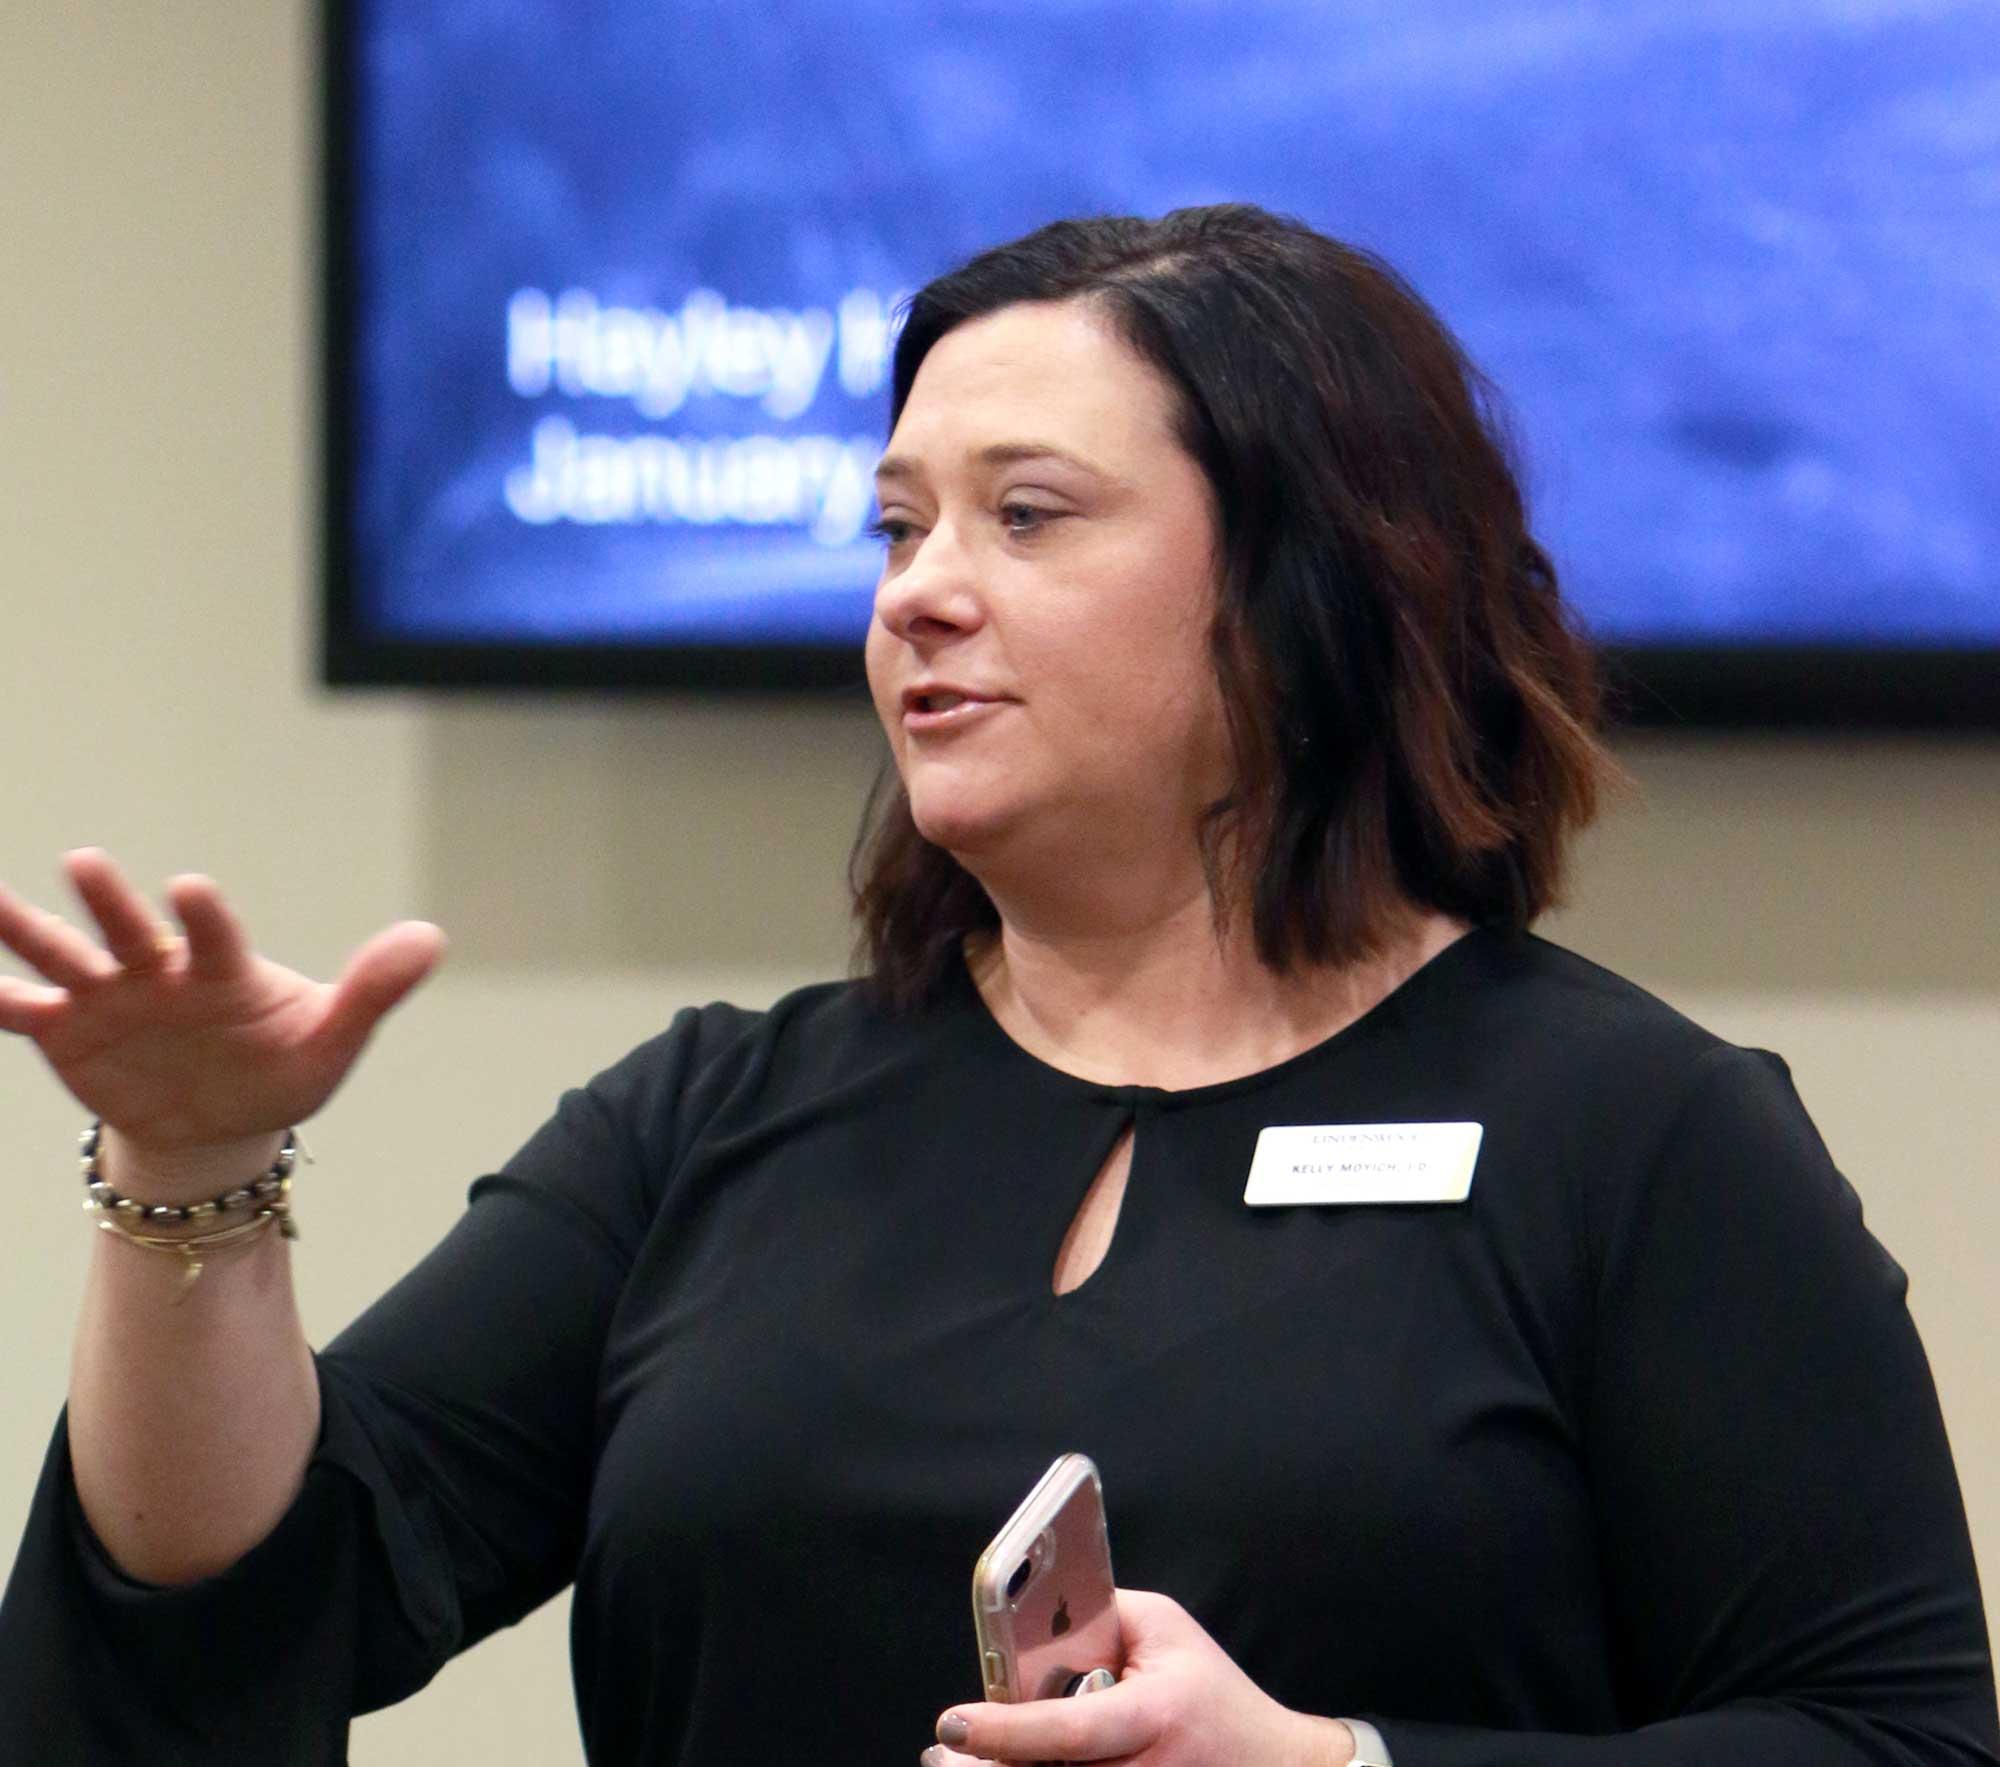 Kelly Moyich, Lindenwood University Title IX coordinator